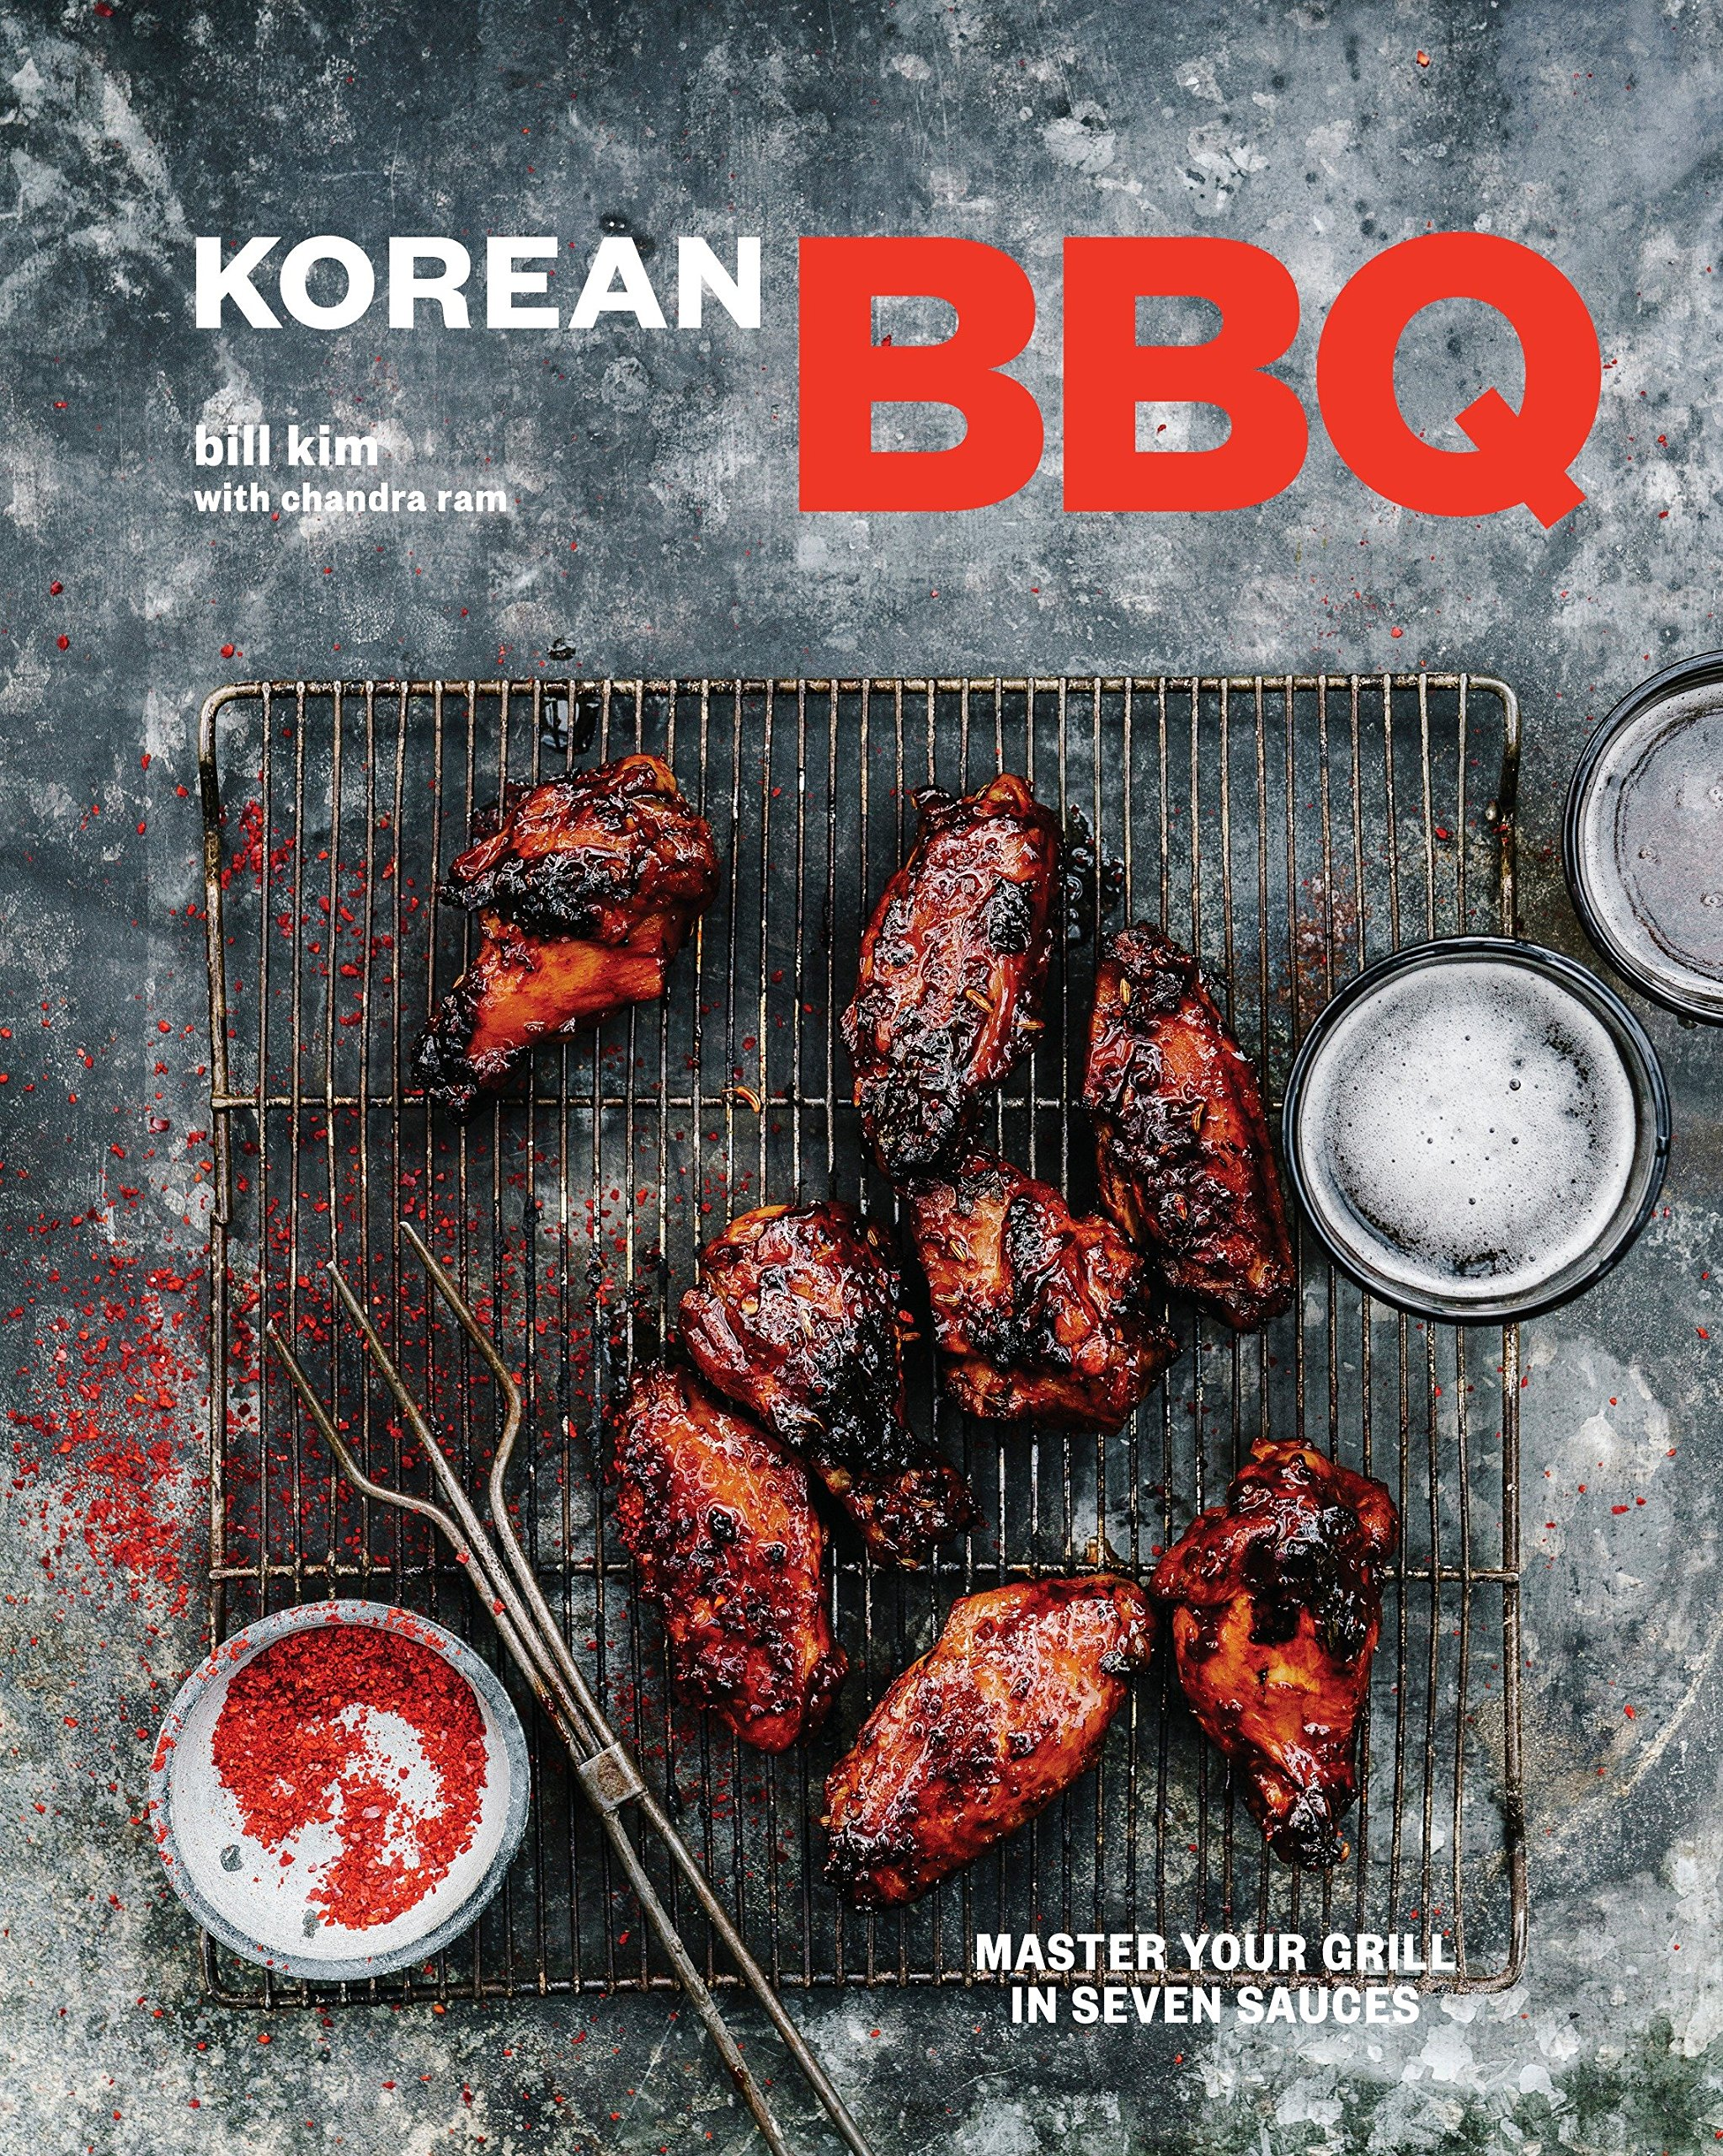 Korean Bbq Master Your Grill In Seven Sauces Bill Kim Chandra Ram